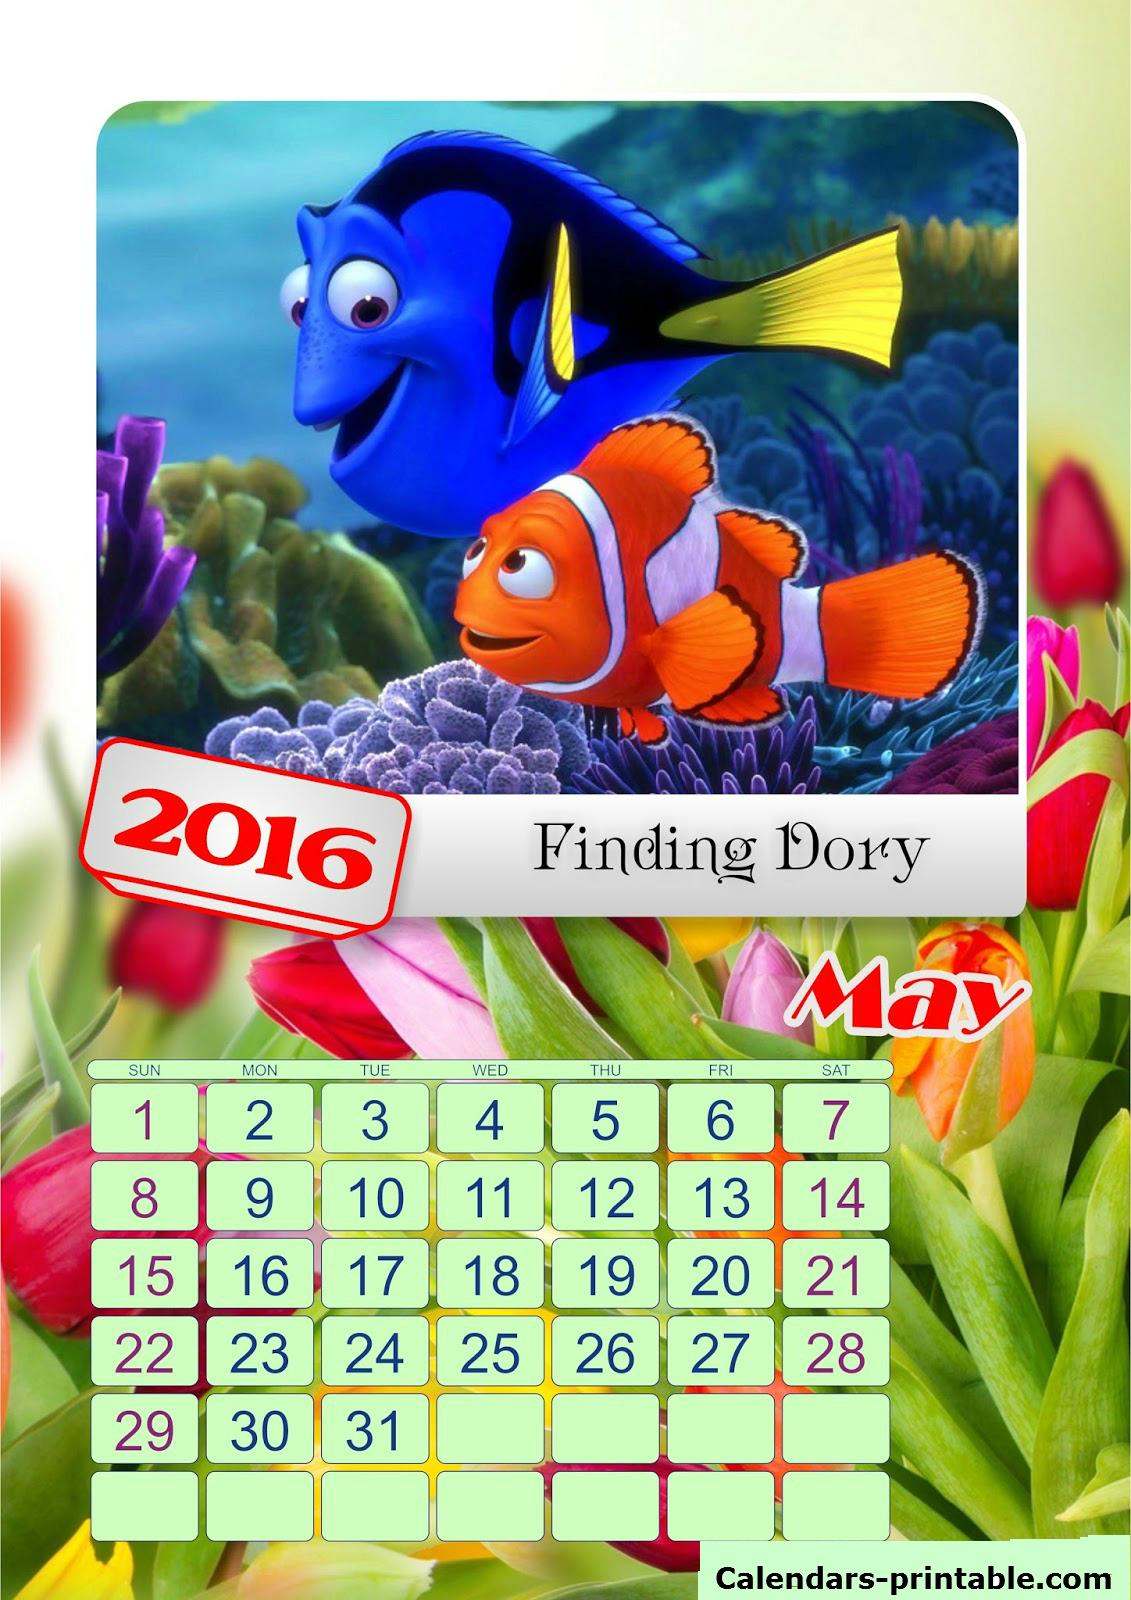 2016 May Calendar For Kids